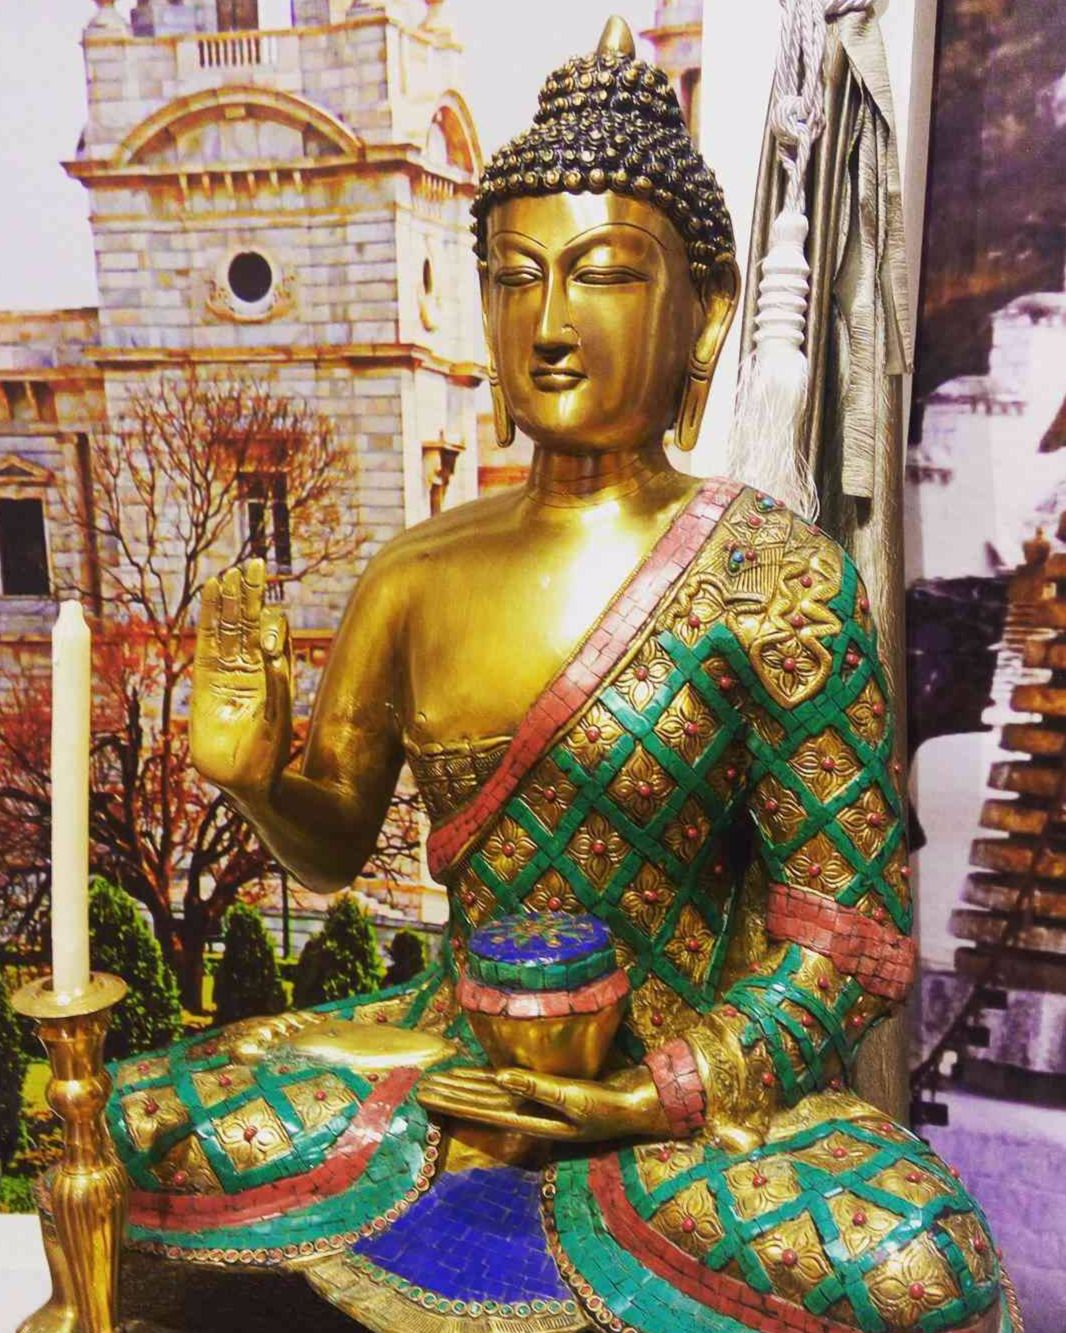 #buddha #waxstatue #jaipur_wax_museum #jaipurwaxmuseum #jwm #jaipur #rajasthan